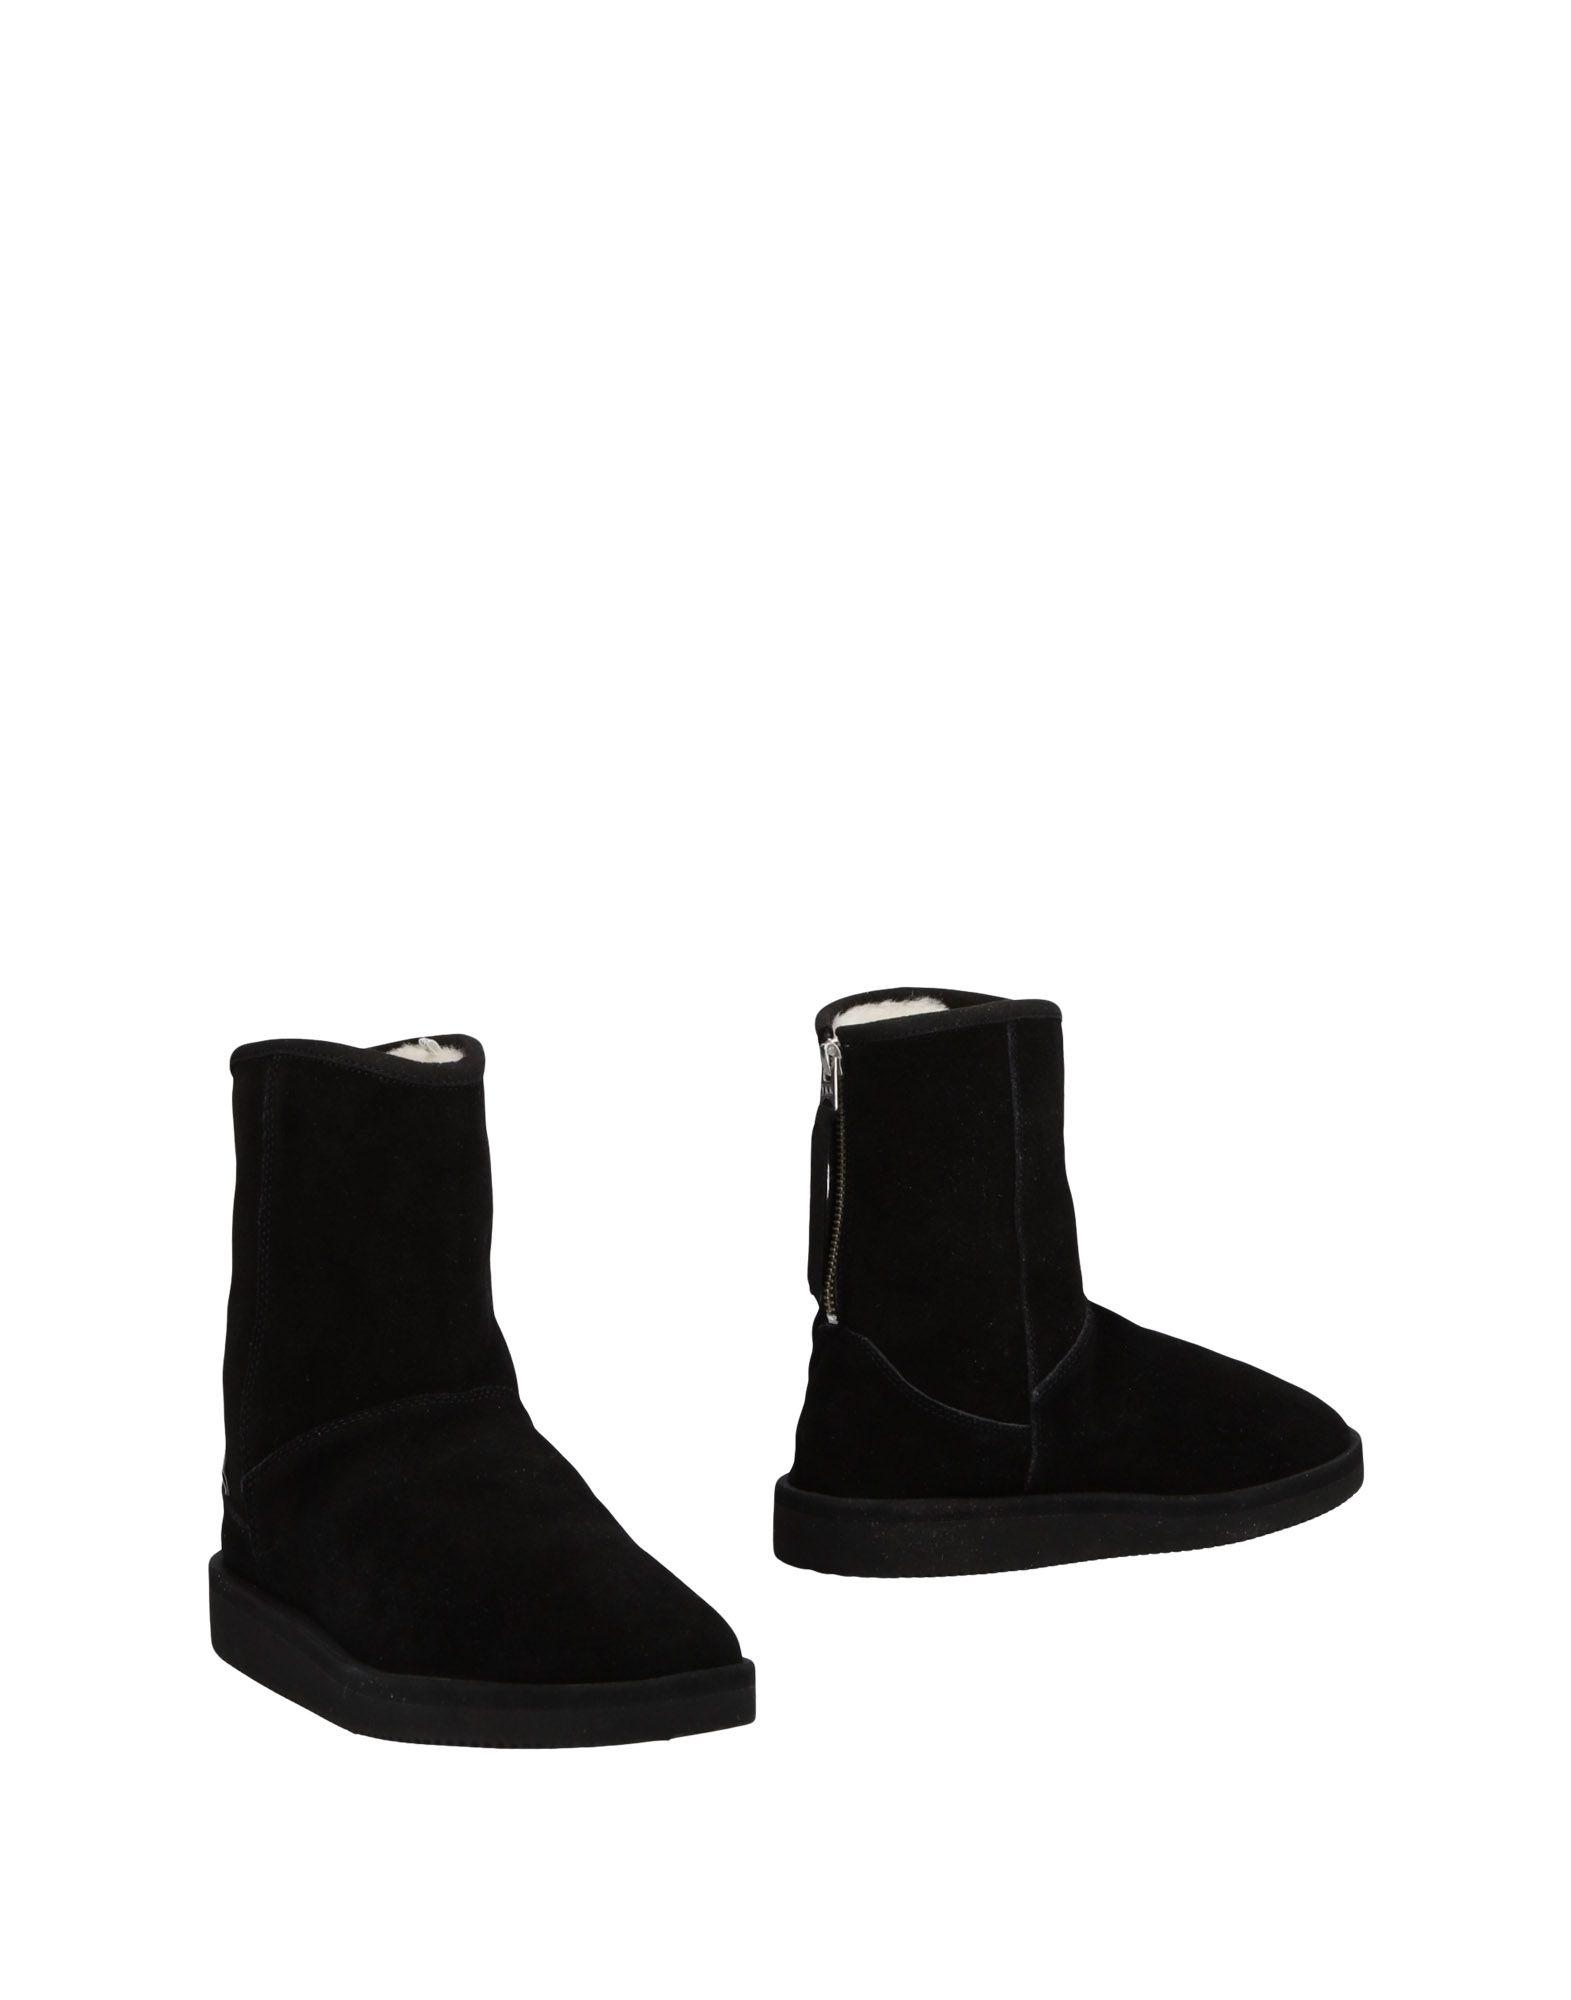 Suicoke Stiefelette Damen  11474843WIGut aussehende strapazierfähige Schuhe